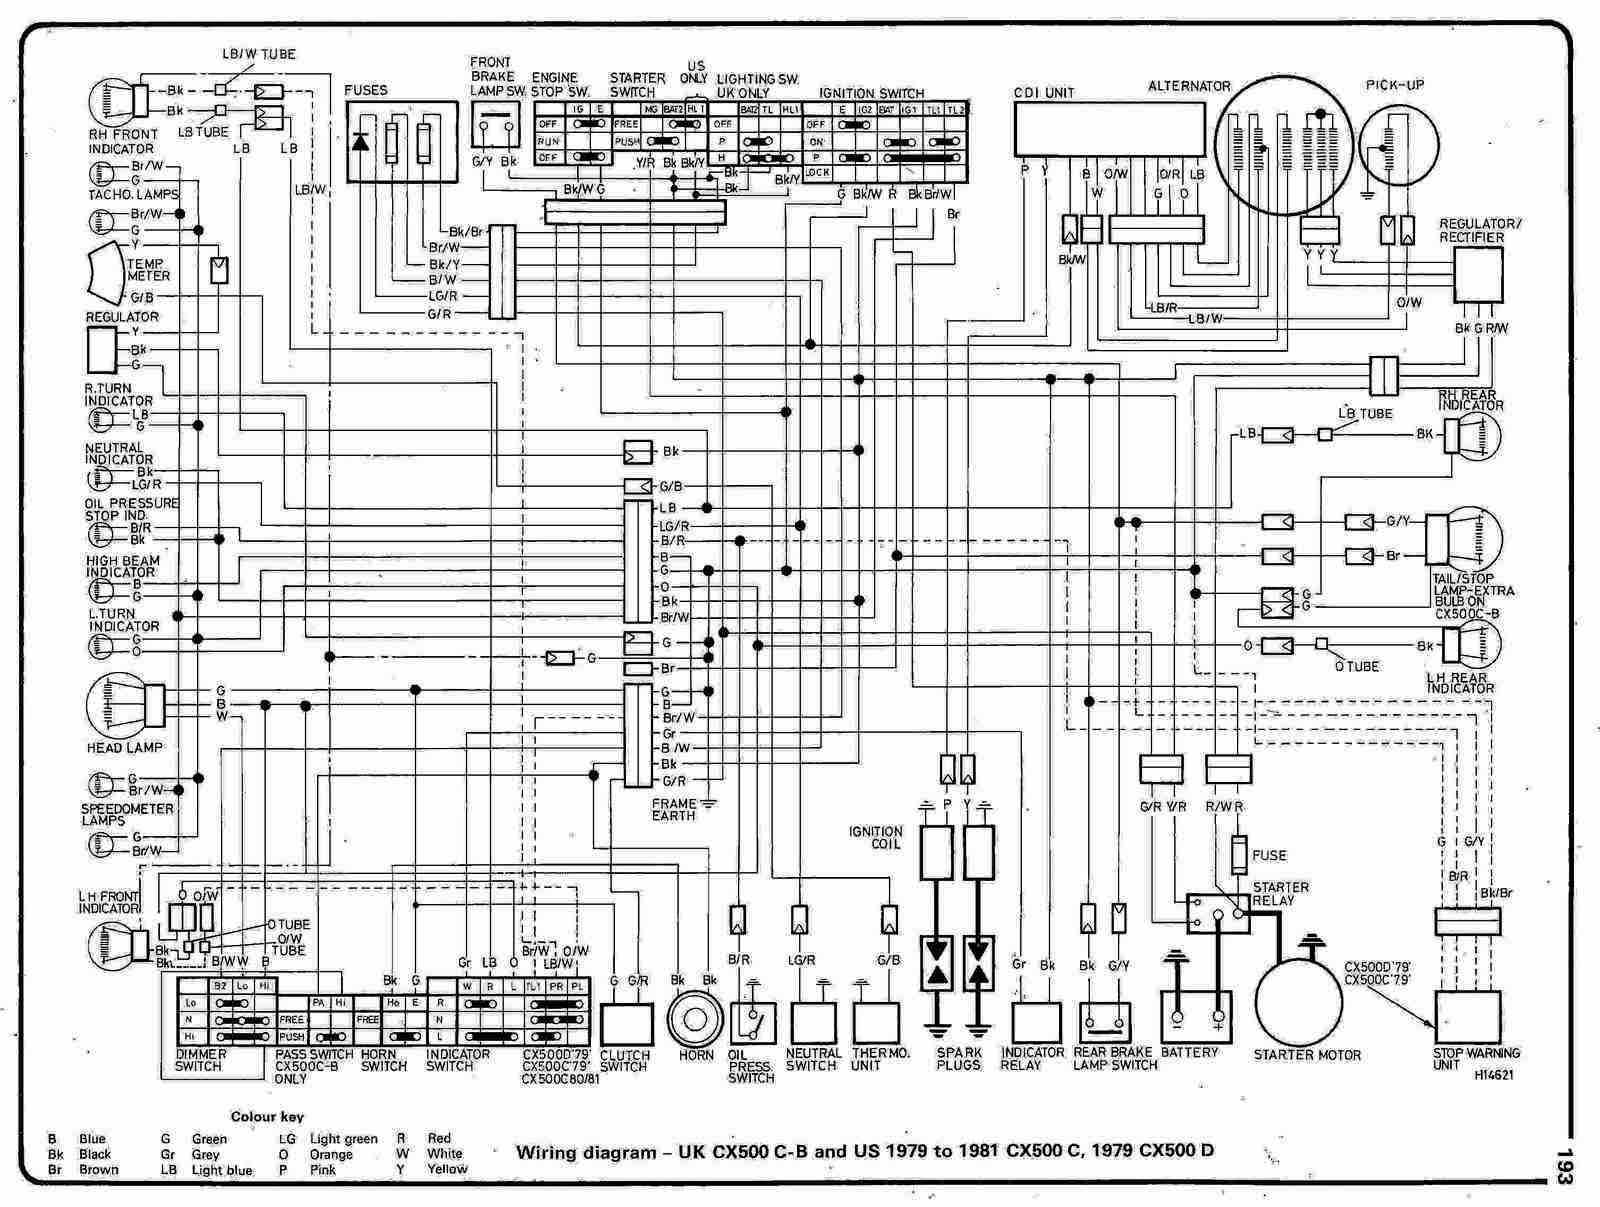 Honda Mt250 Wiring Diagram Trusted Diagrams Sl70 Fairing For 1982 Gl500 Diy U2022 Cb550